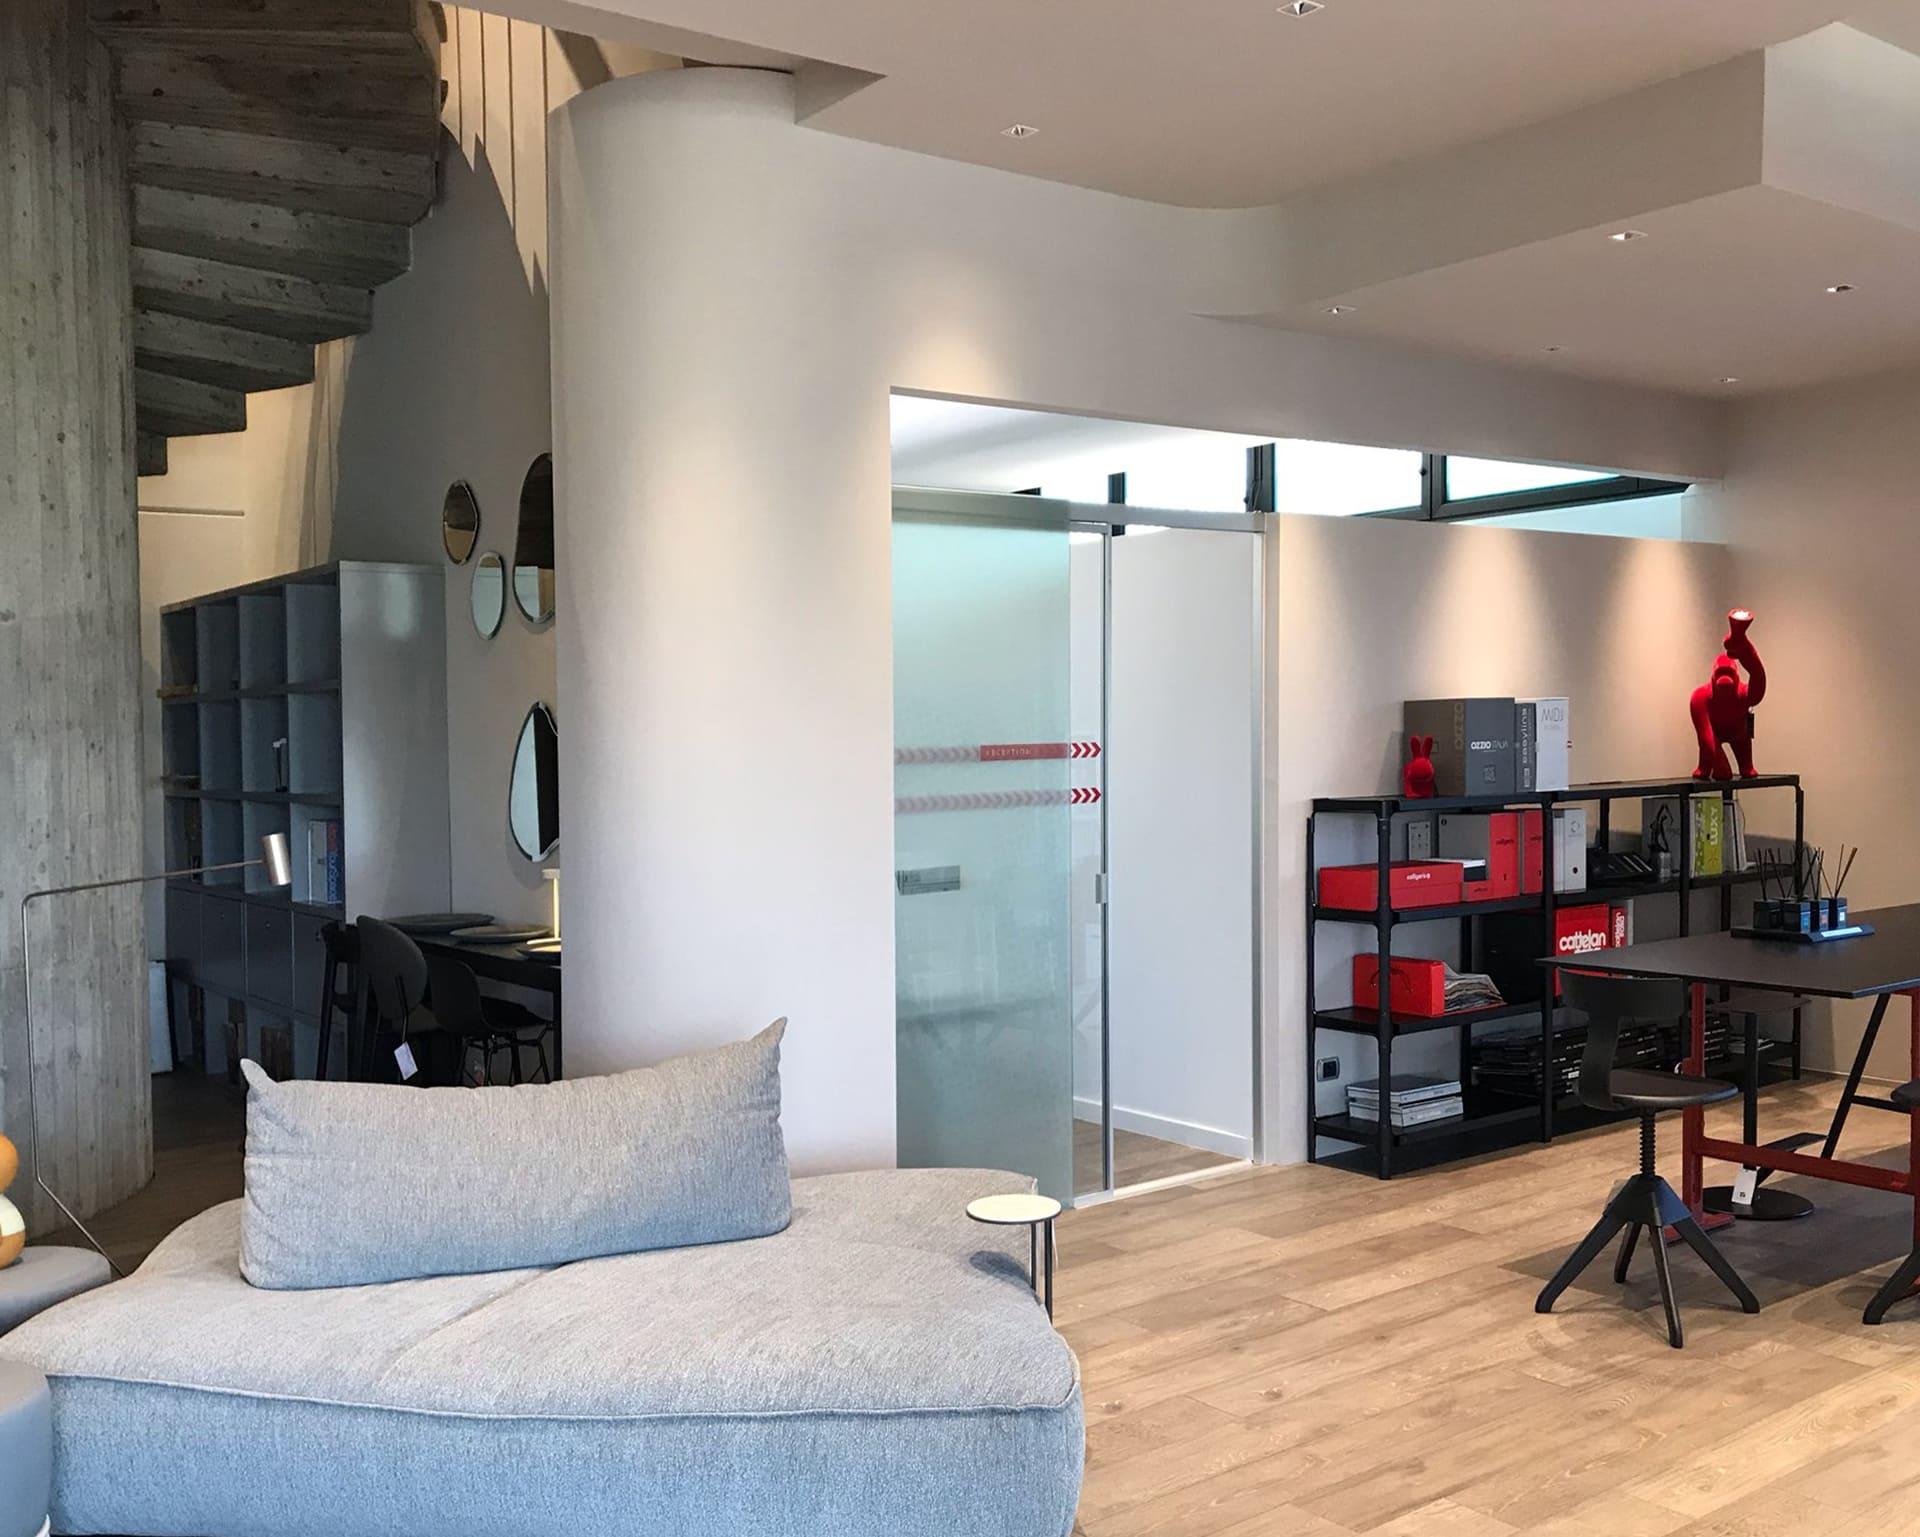 bancone-showroom-arredamento-DOPO-agg